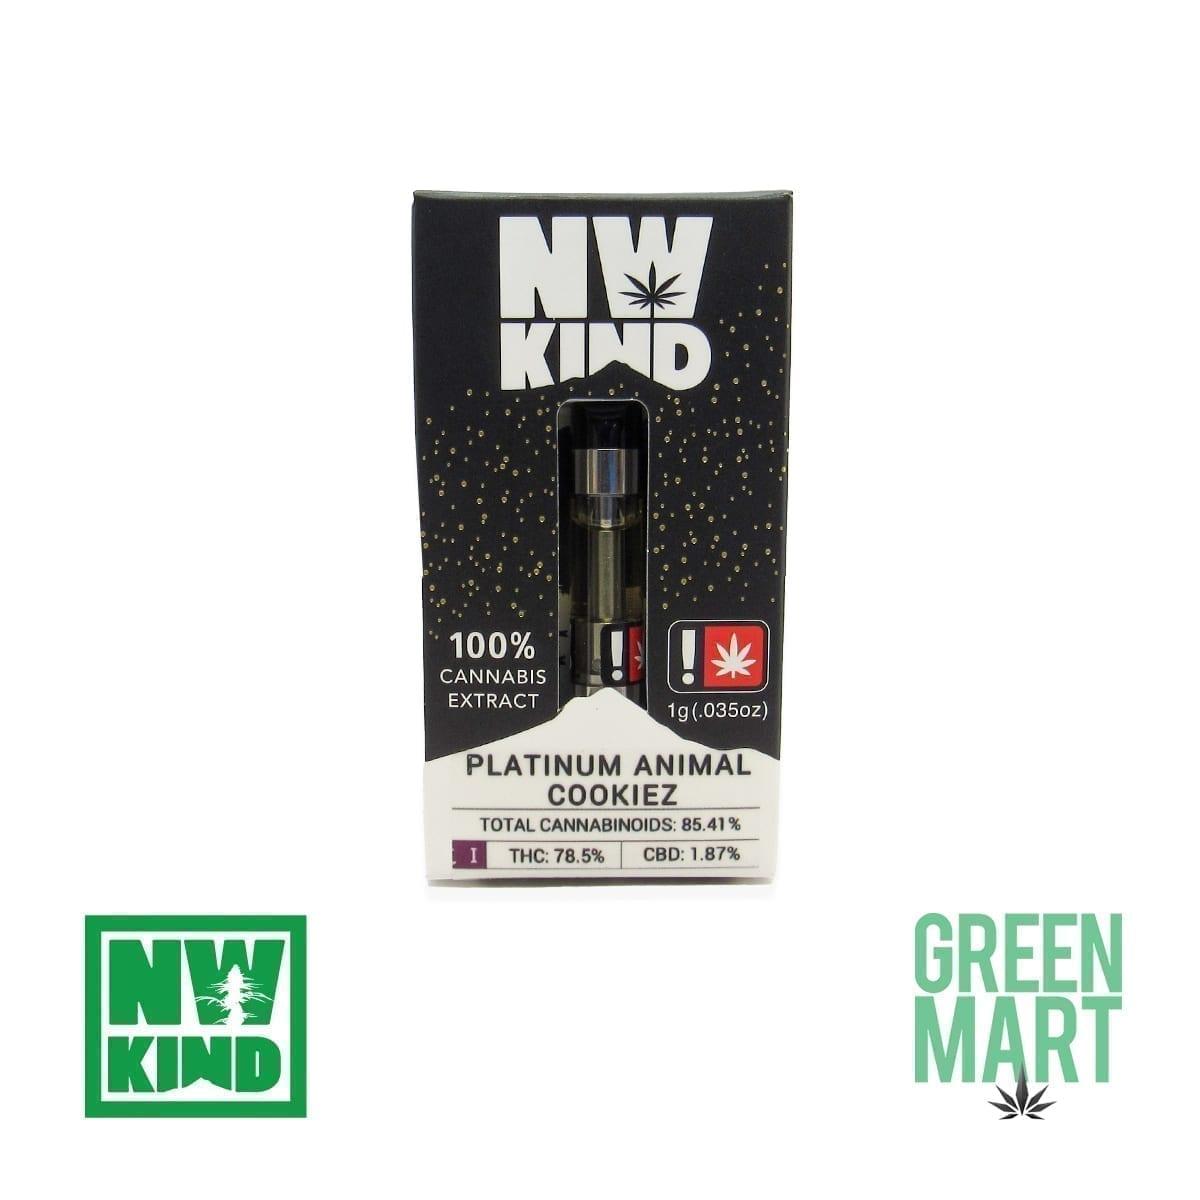 NW Kind Distillate Cartridge - Platinum Animal Cookiez